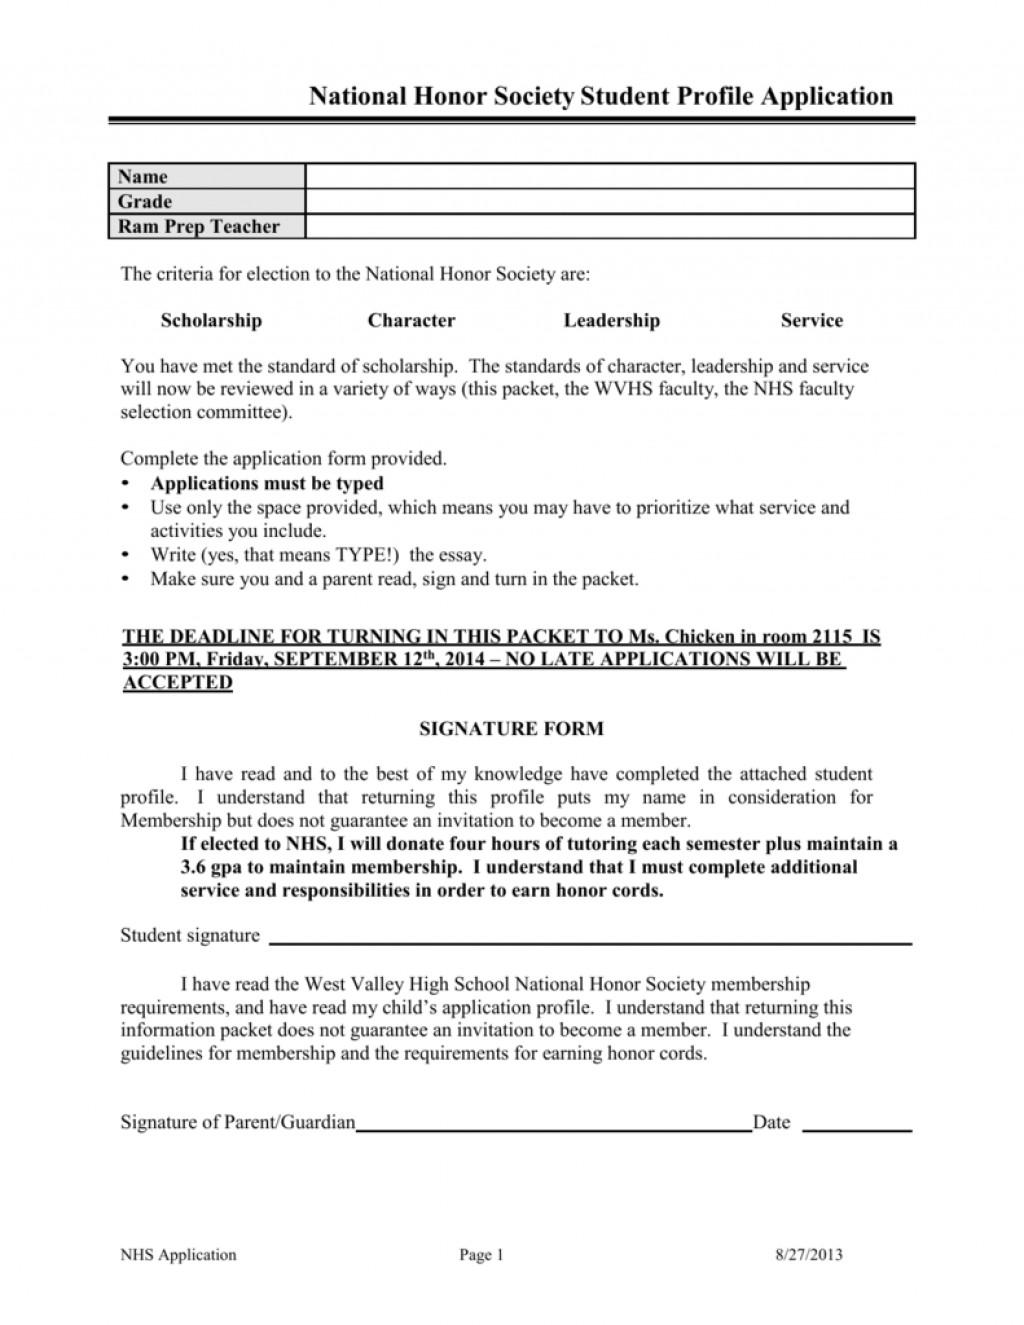 021 006915569 1 National Honor Society Application Essay Sensational Junior Ideas Examples Large